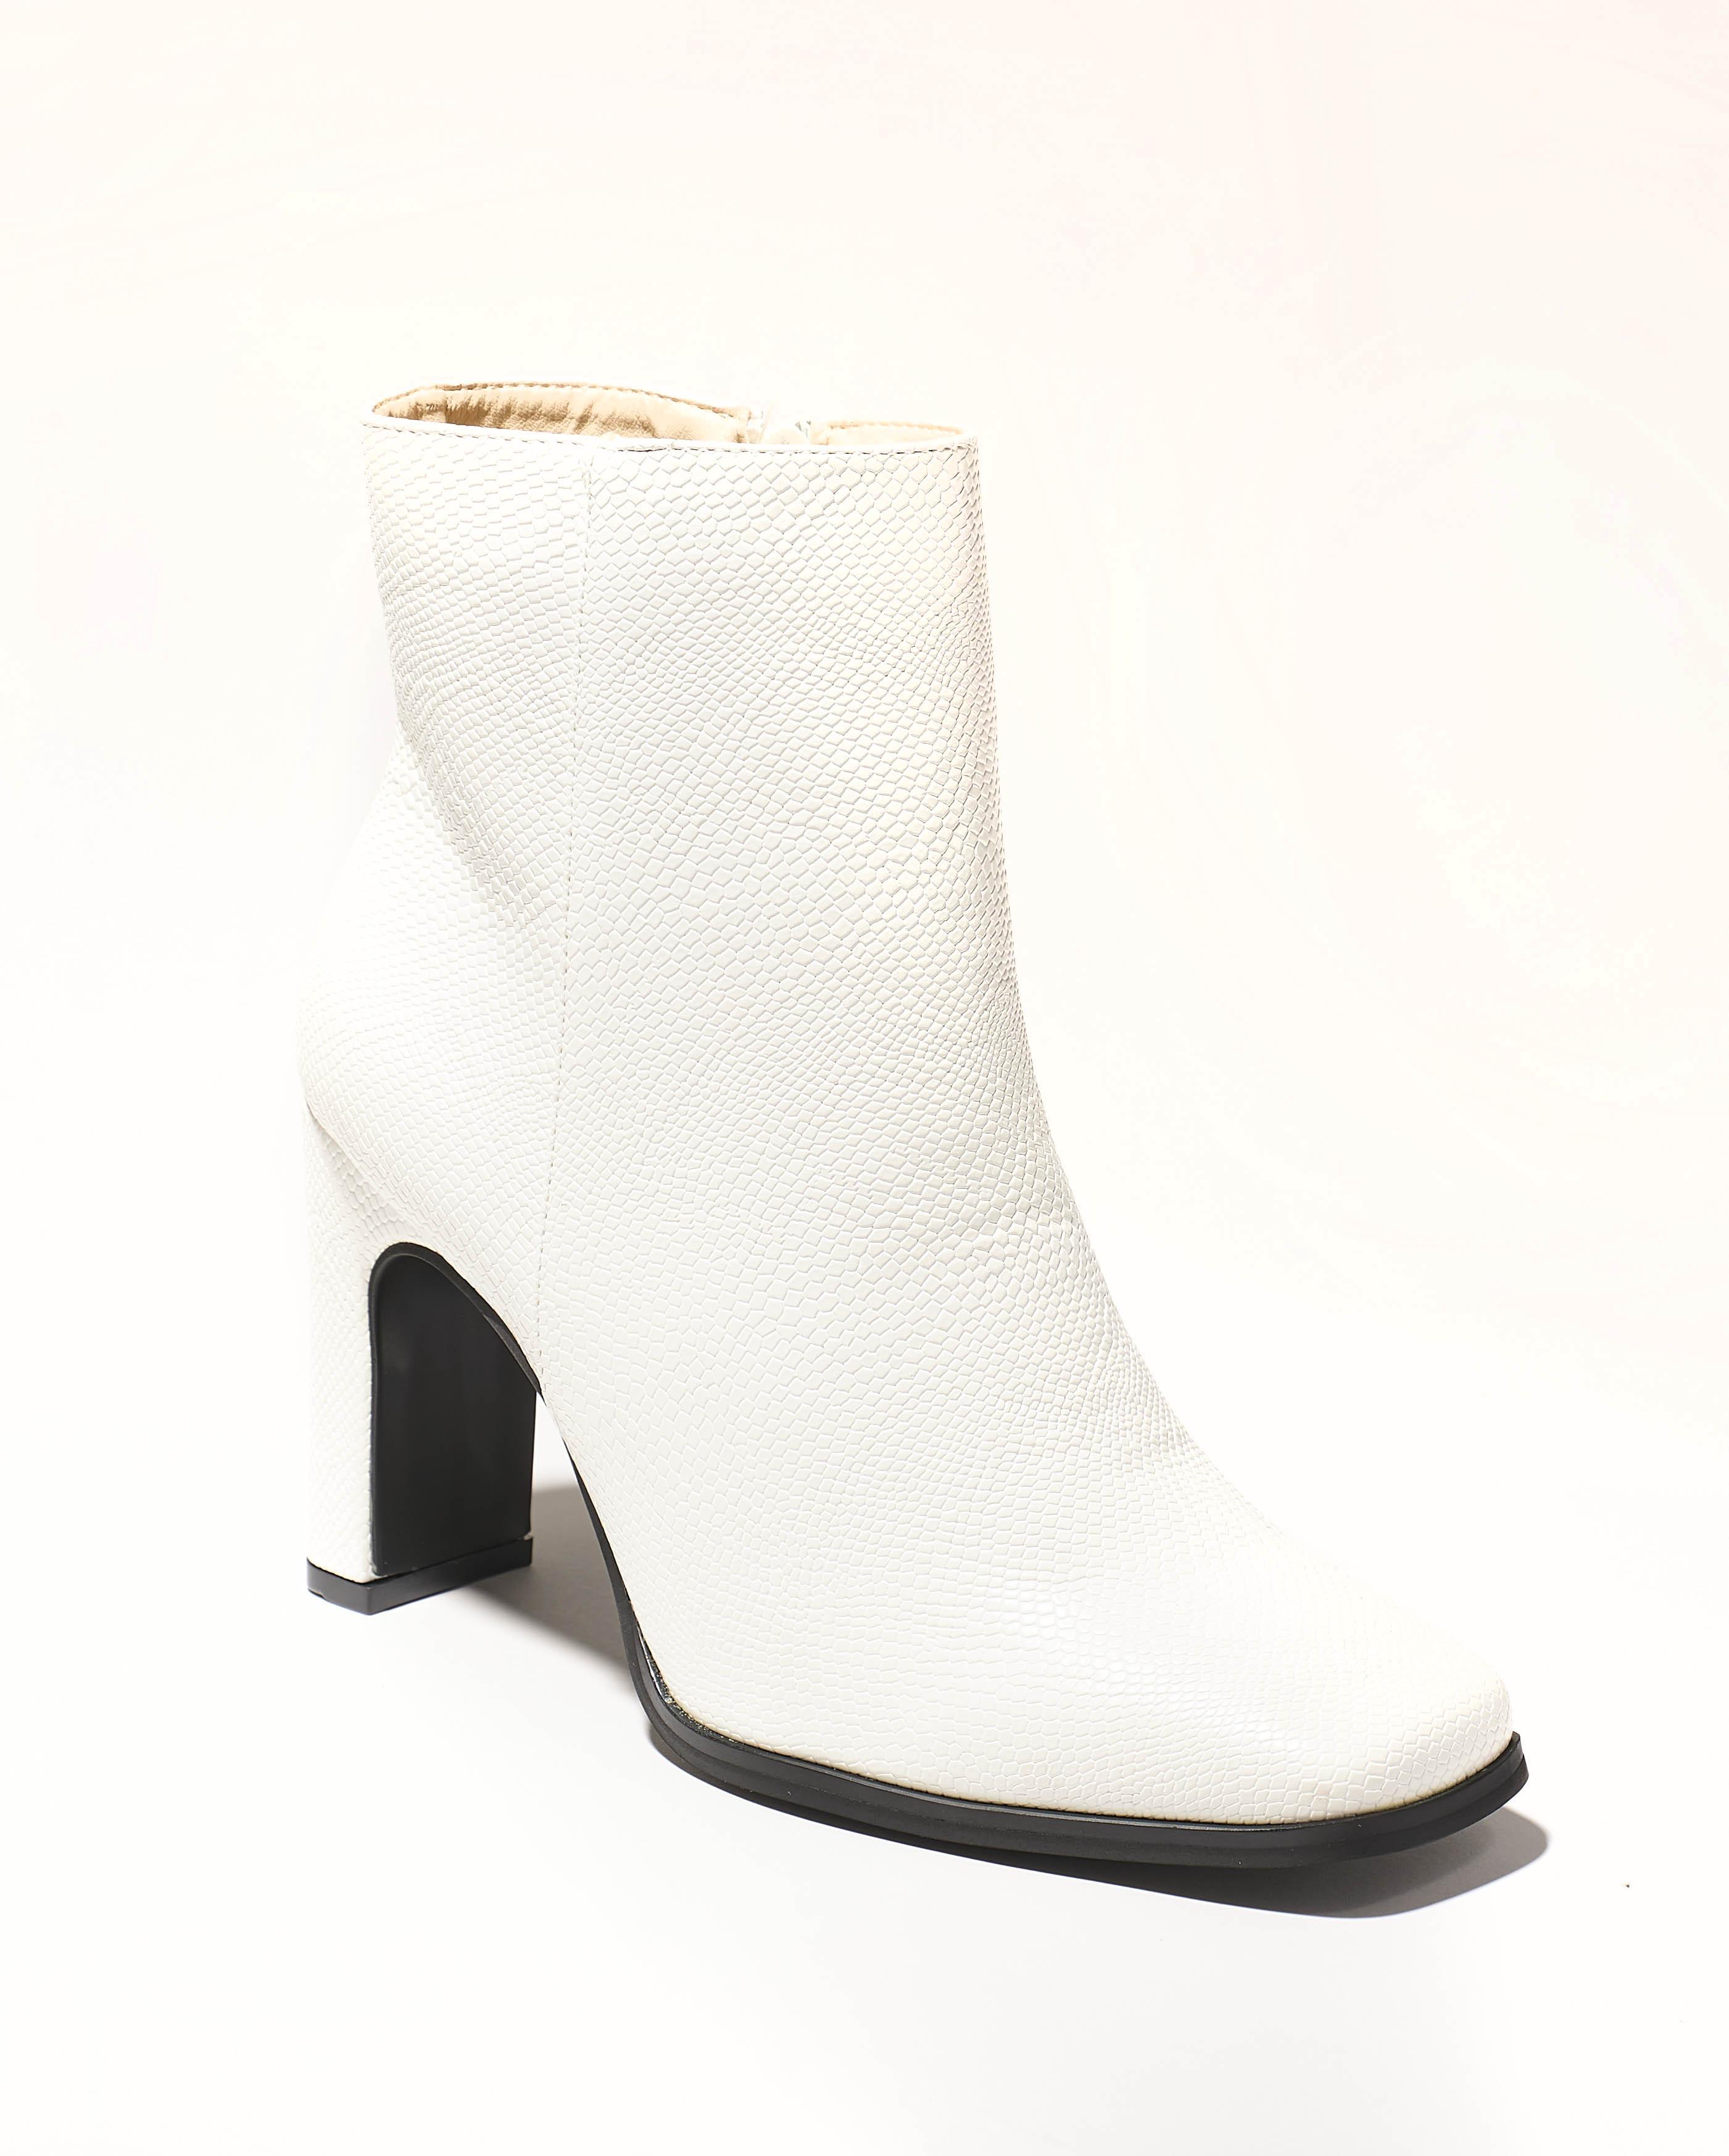 Boots Femme - Boots Blanc Jina - 9377-2